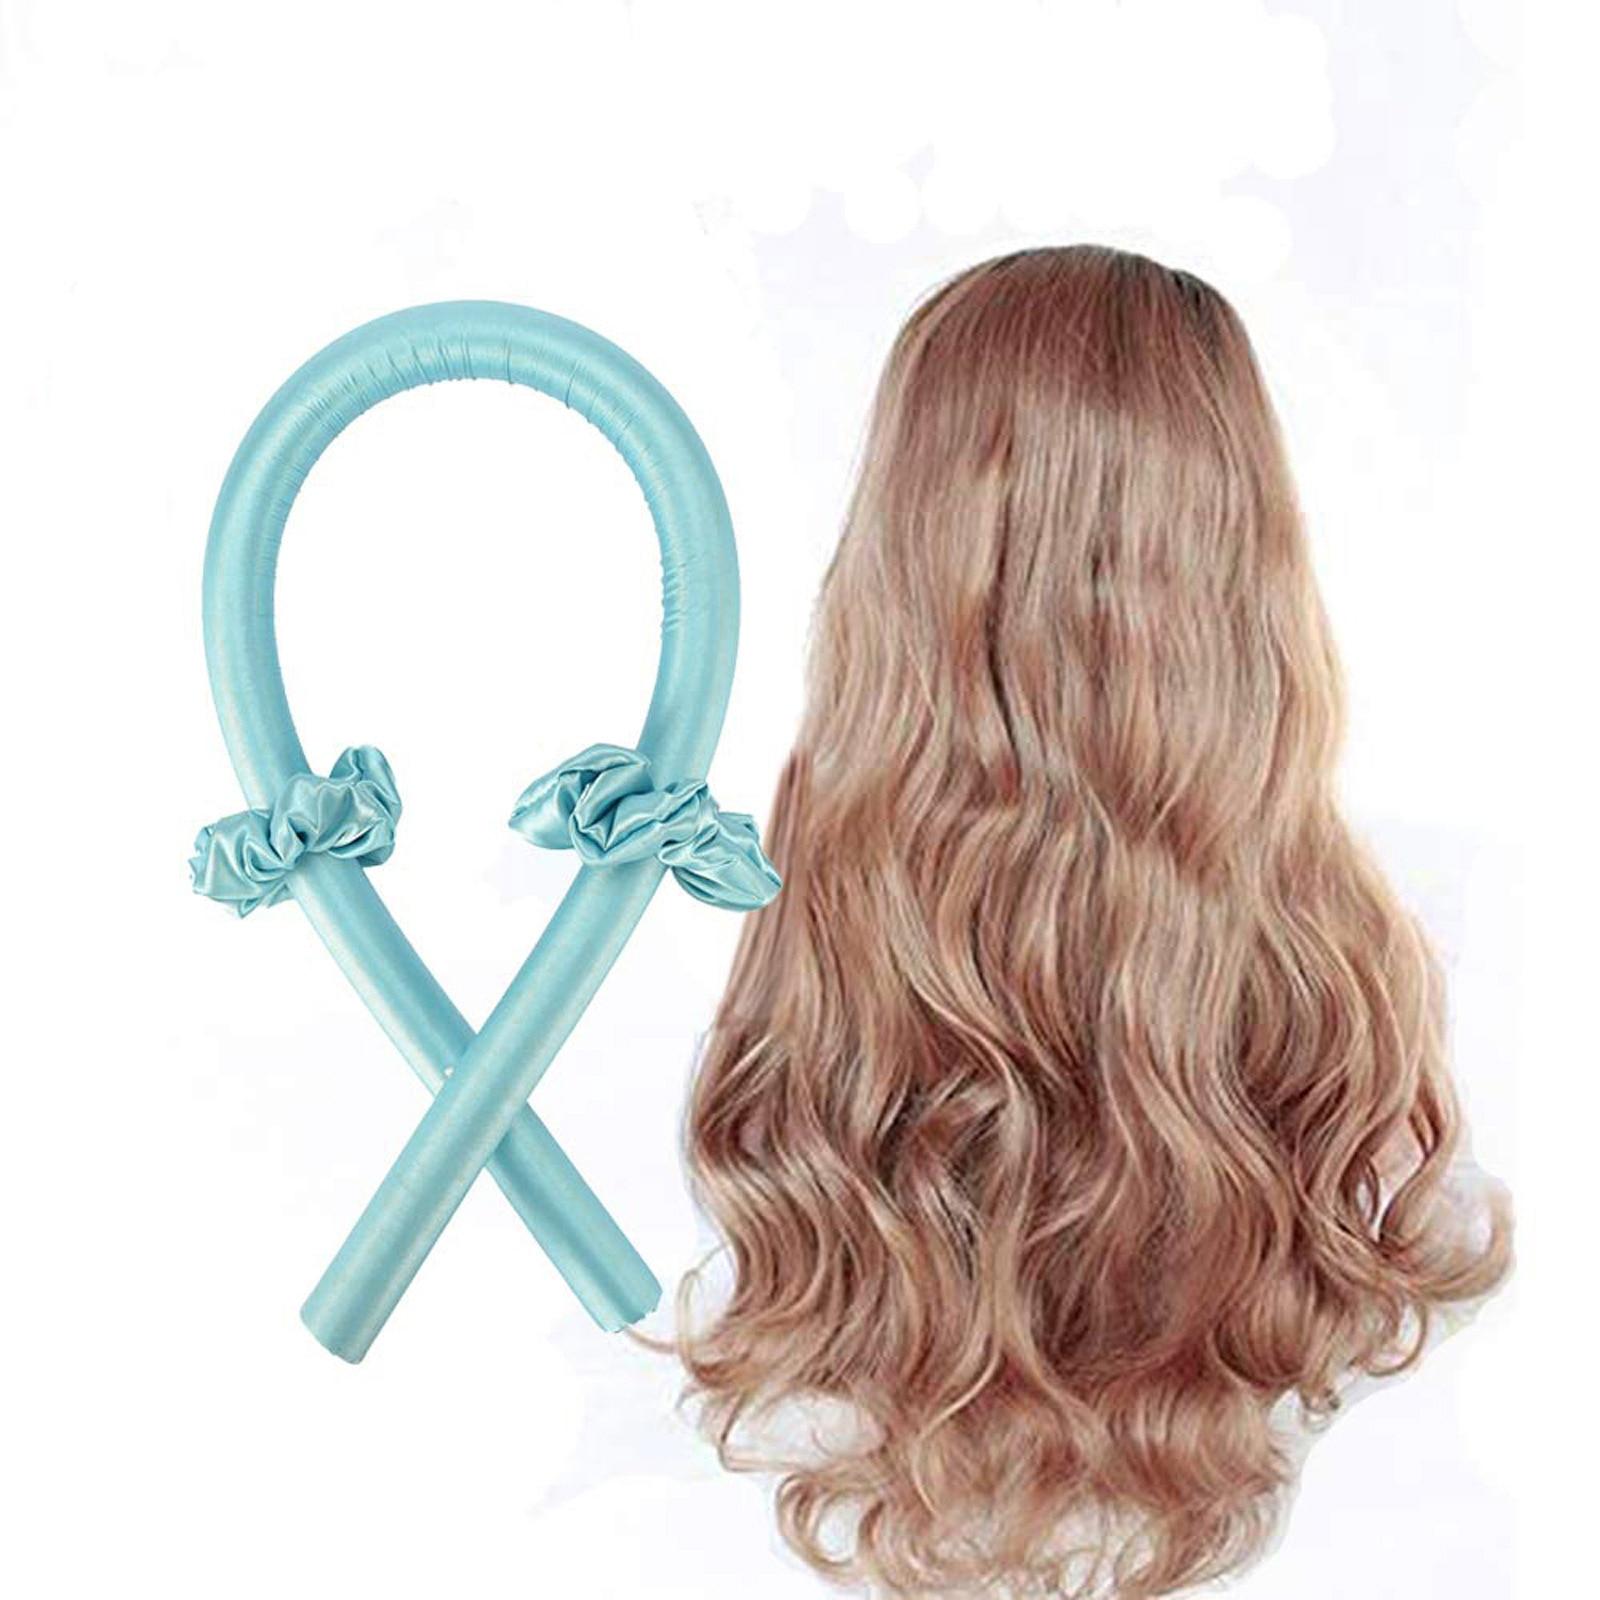 3PCS/Set Heatless Hair Curlers For Long Hair To Sleep In Overnight and No Heat Silk Curls Headband w